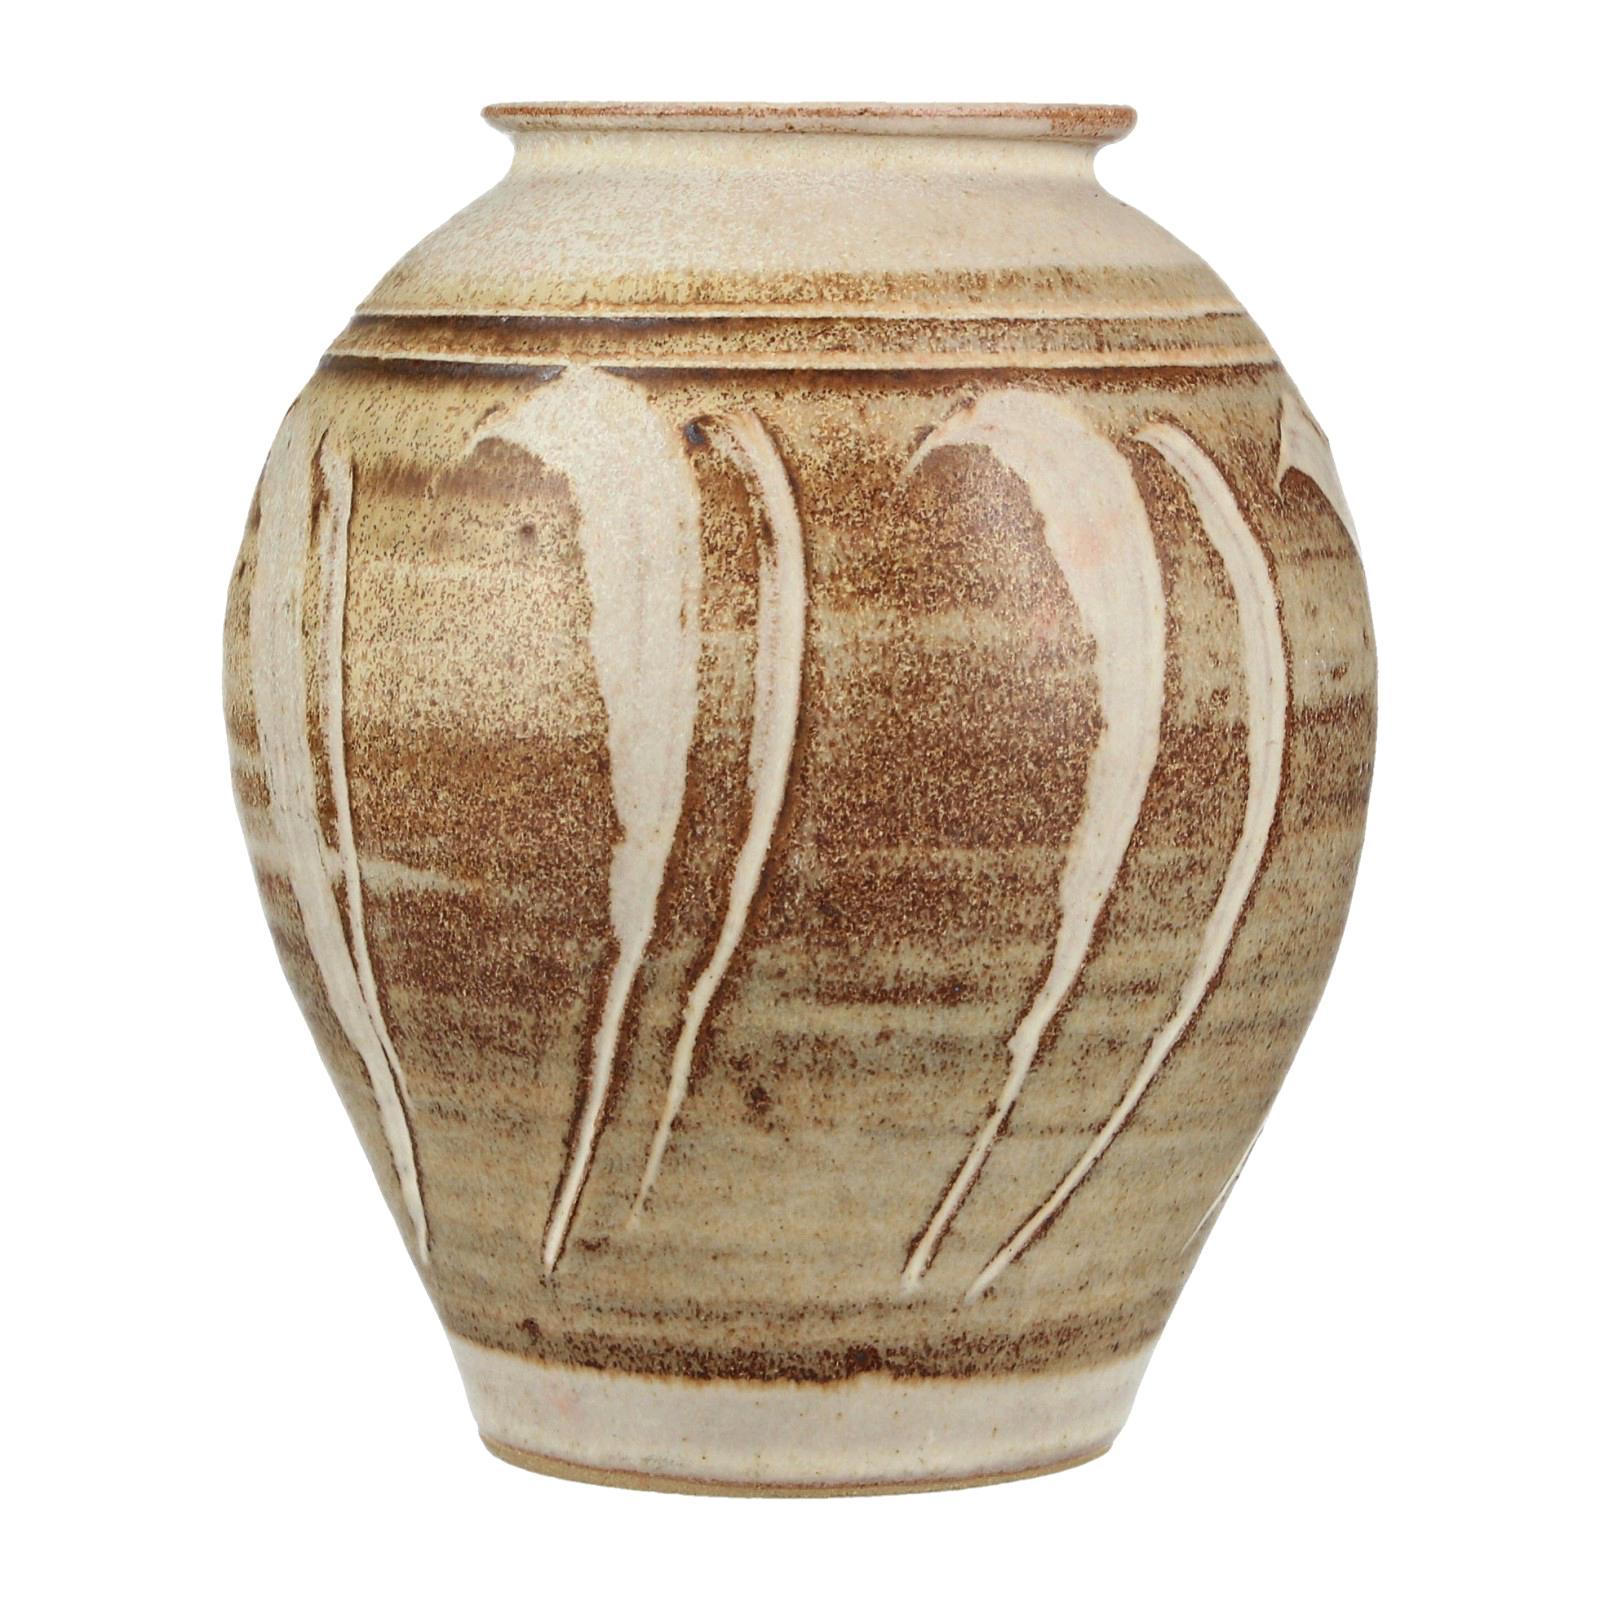 An anvil pottery vase maentwrog welsh studio pottery ebay image is loading an anvil pottery vase maentwrog welsh studio pottery reviewsmspy